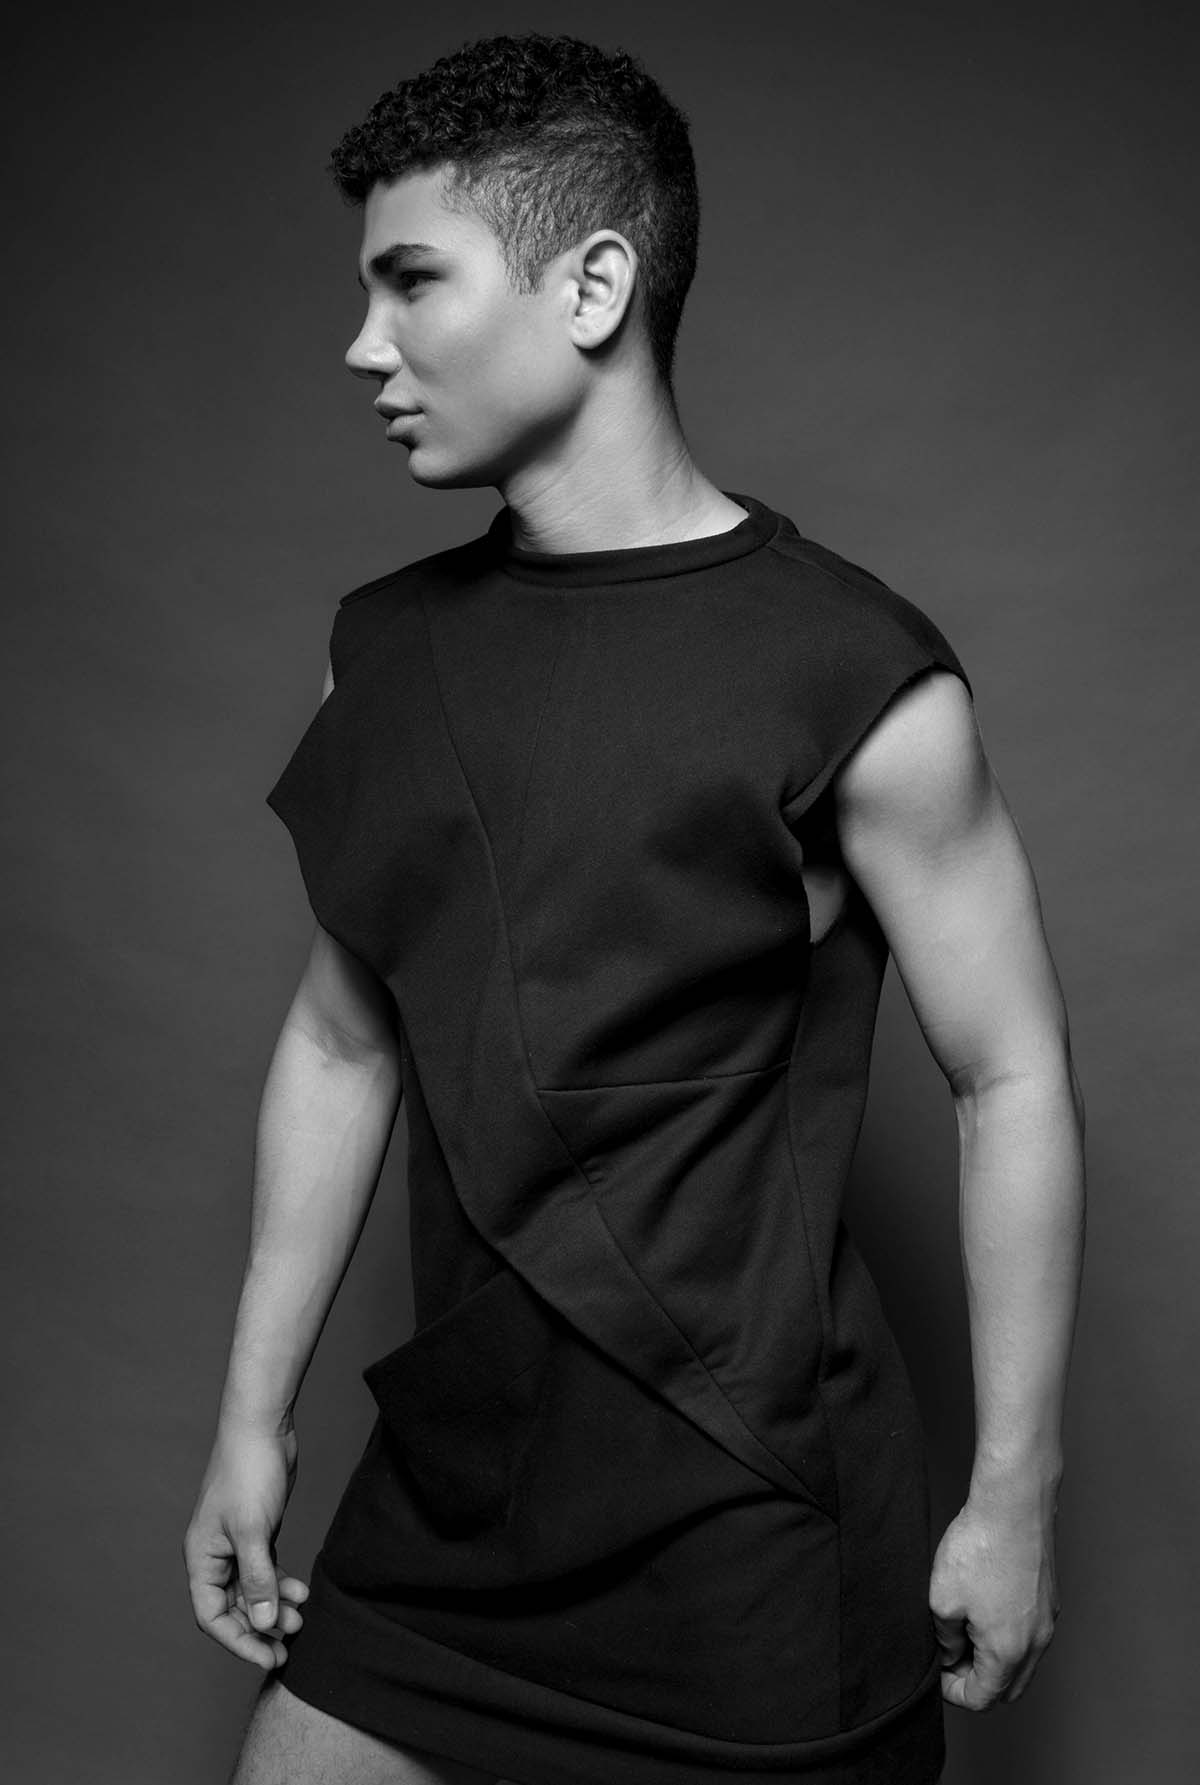 Yuri Ghesini by De Macedo for Brazilian Male Model